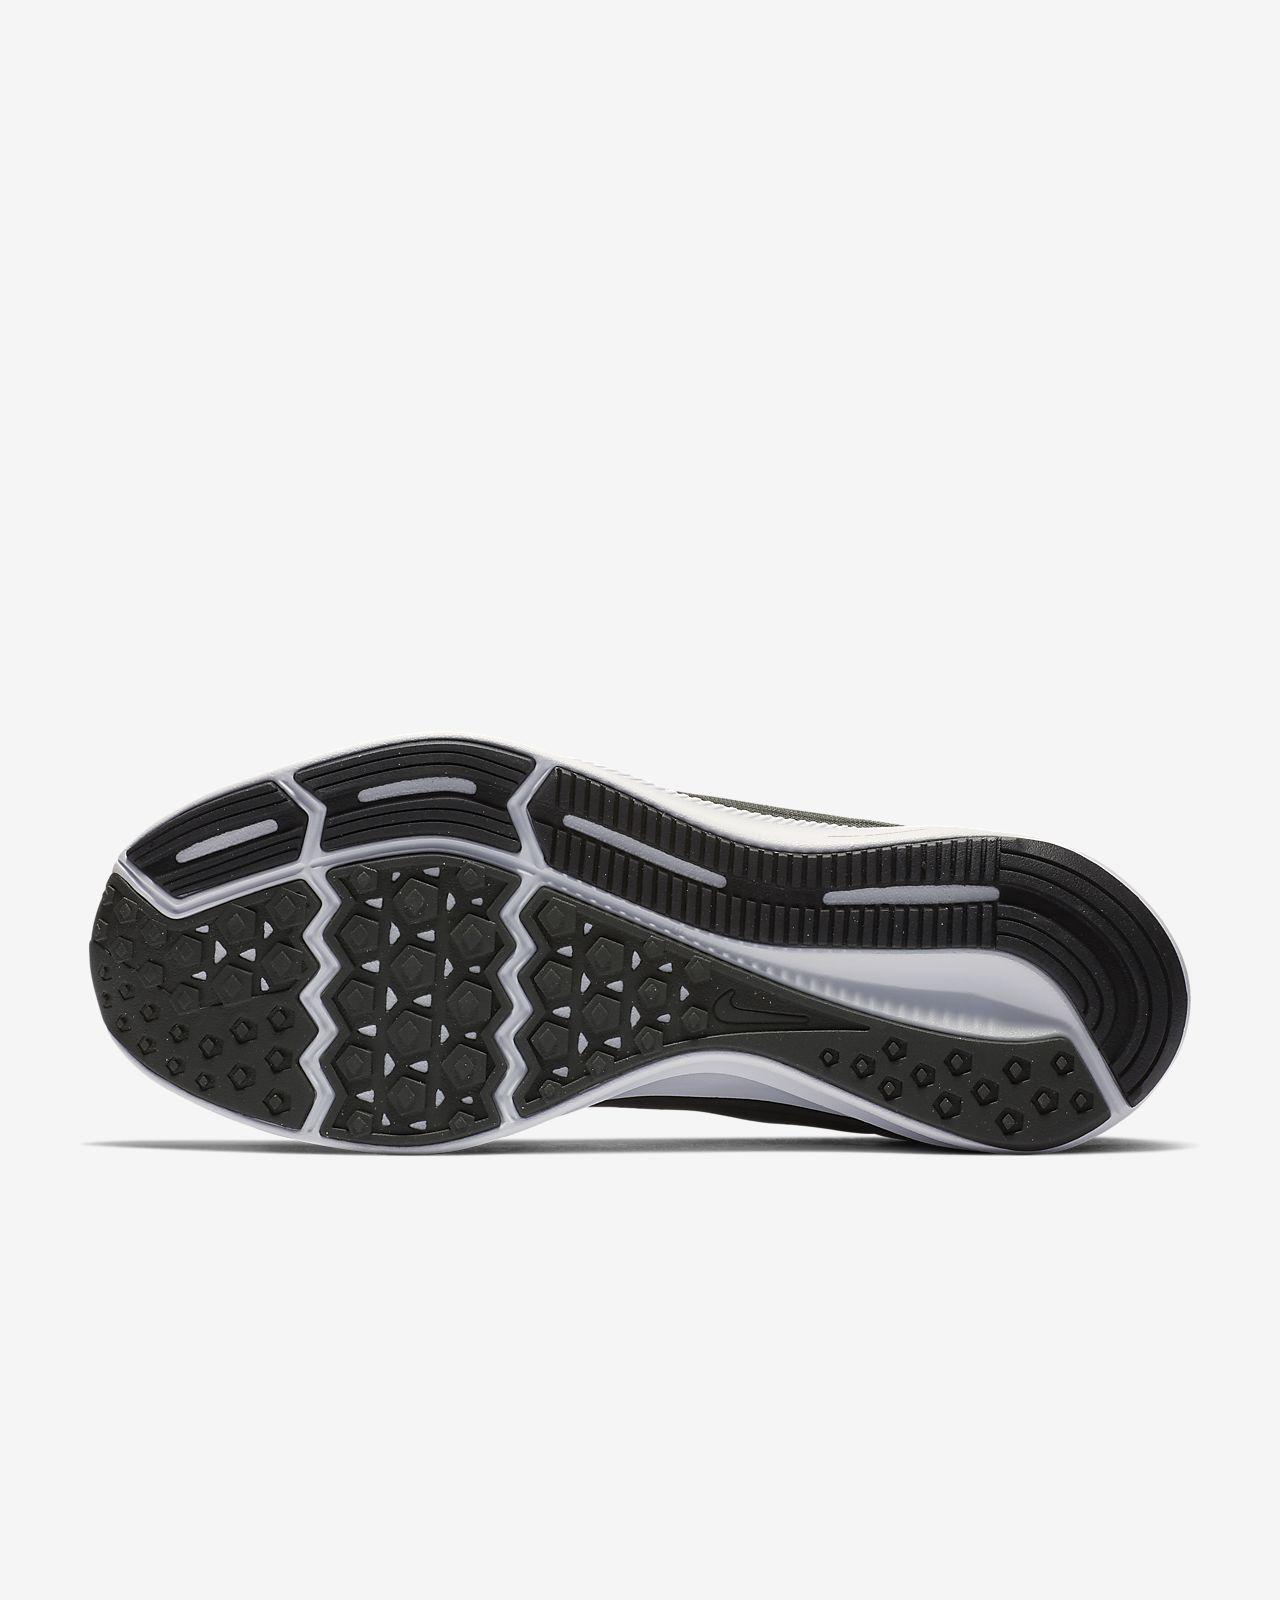 finest selection 7b39e c00fa ... Nike Downshifter 8 Men s Running Shoe